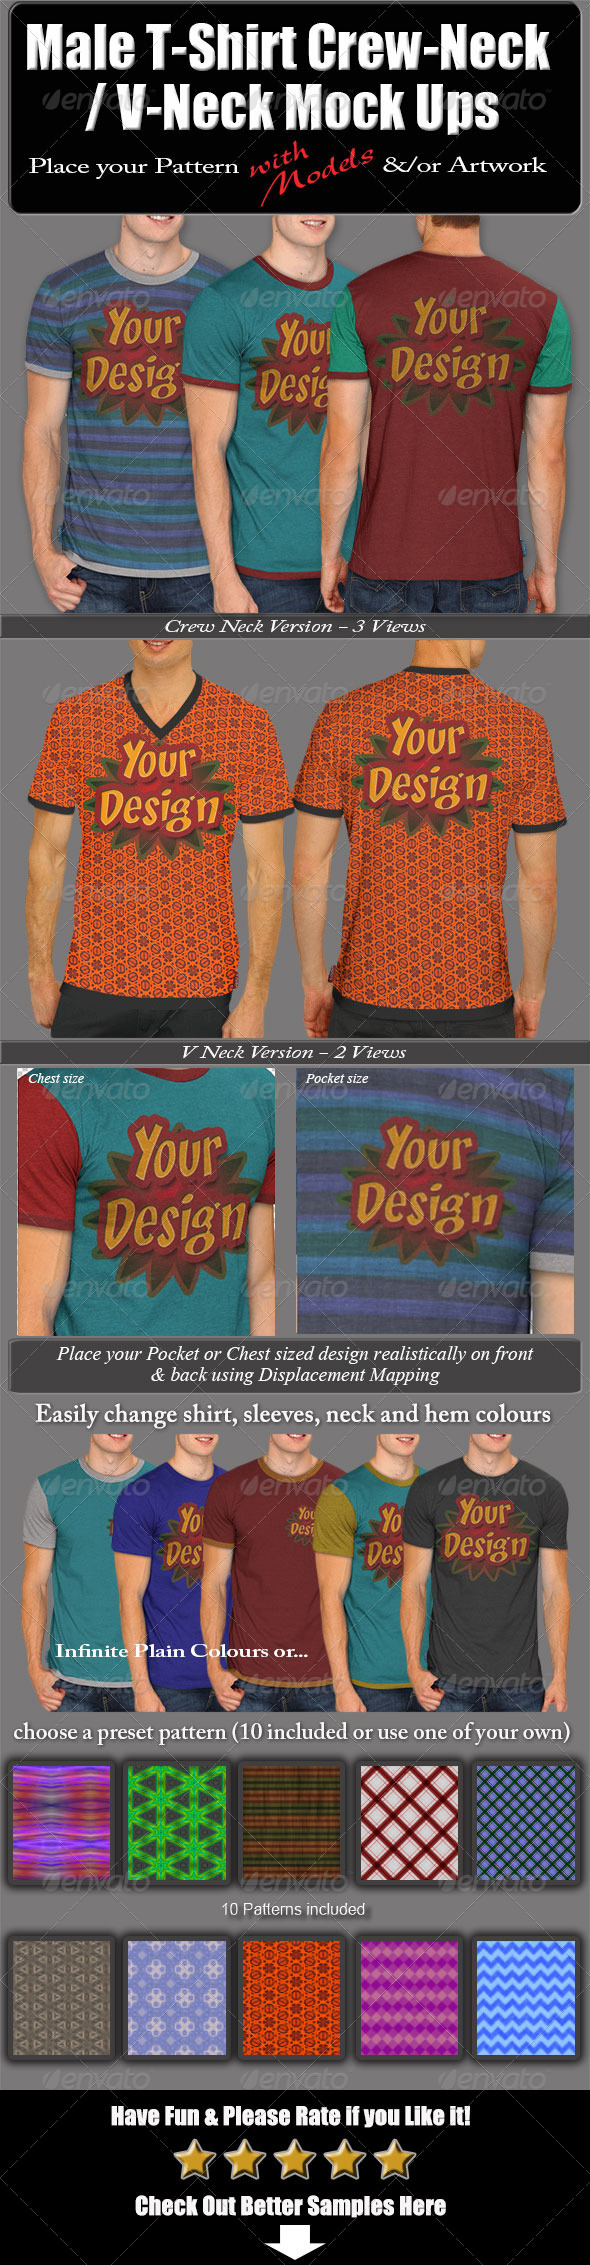 GraphicRiver Male T-Shirt Crew-Neck V-Neck Mock Ups 6480726